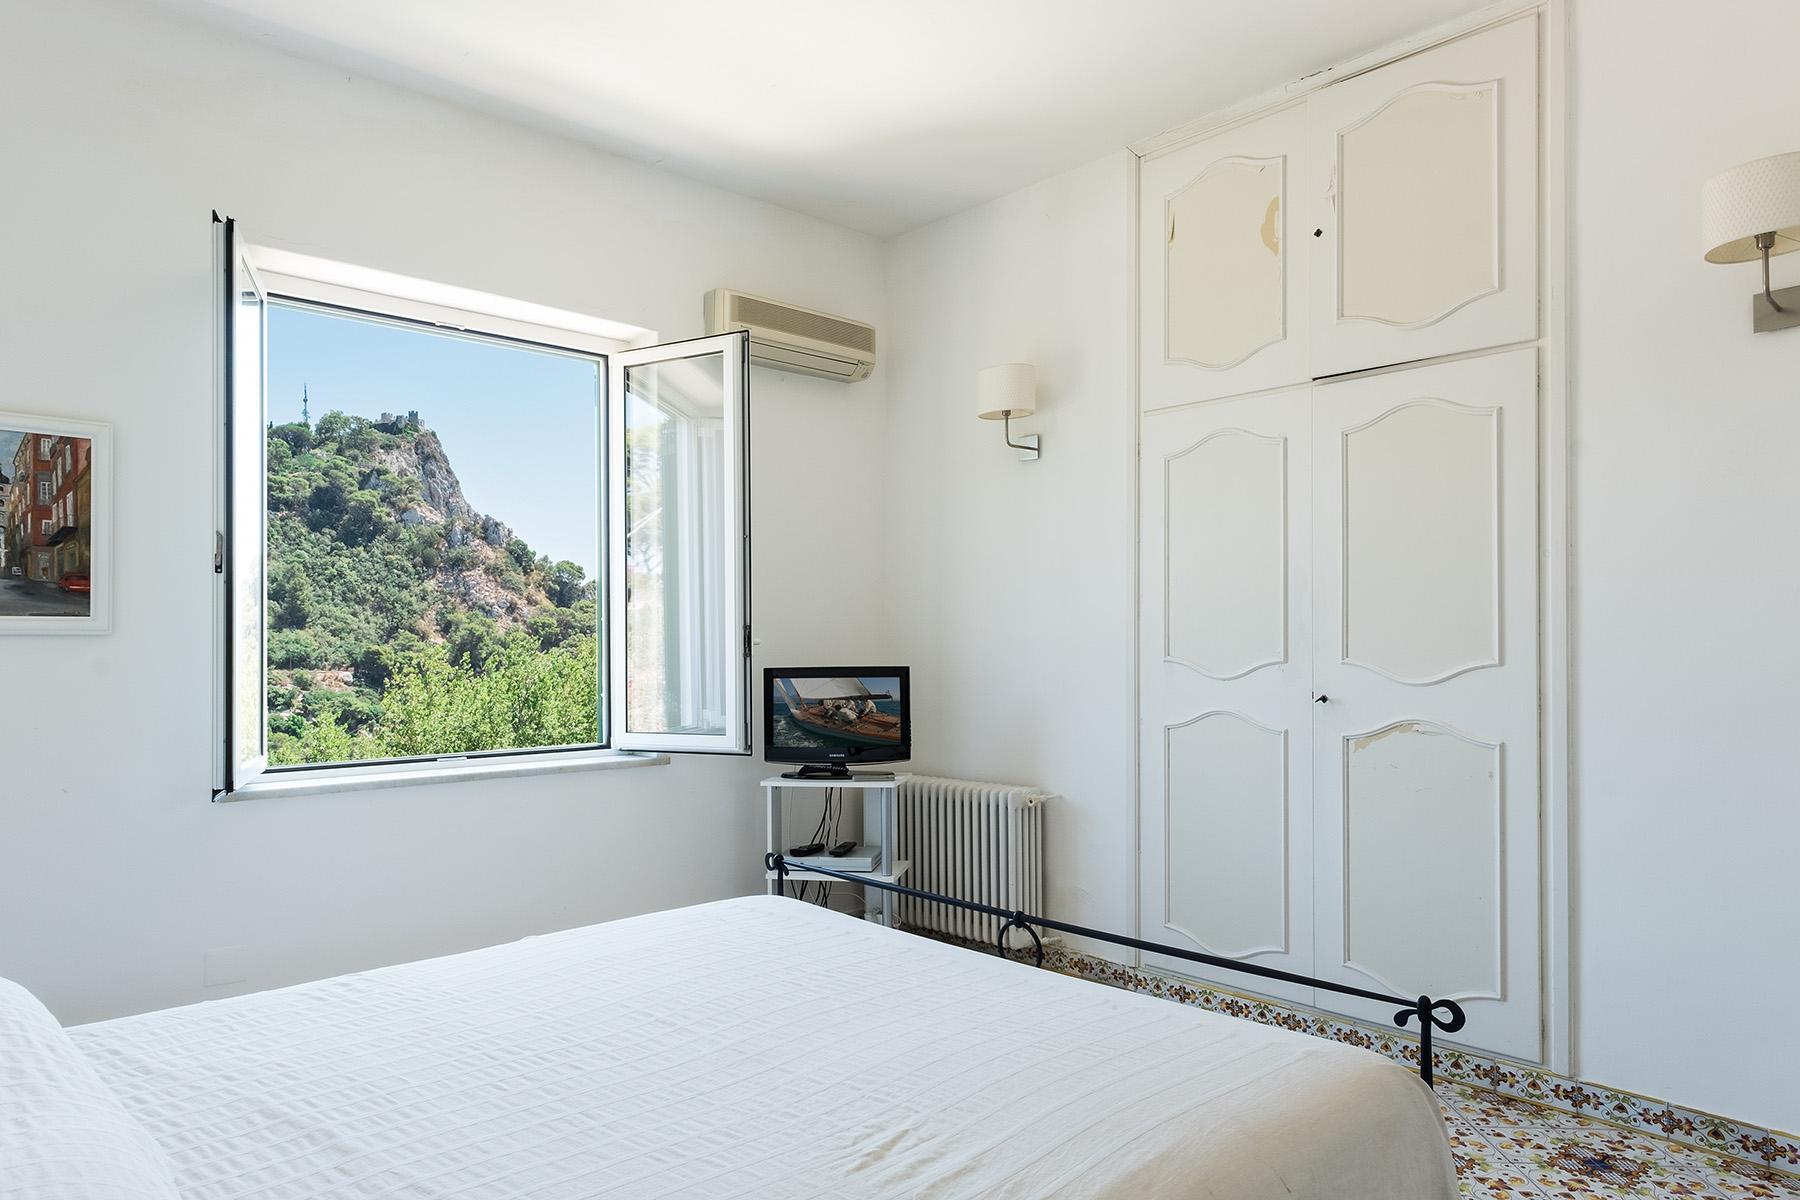 Прекрасная вилла с панорамным видом на море в центре легендарного острова Капри, Италия - 11